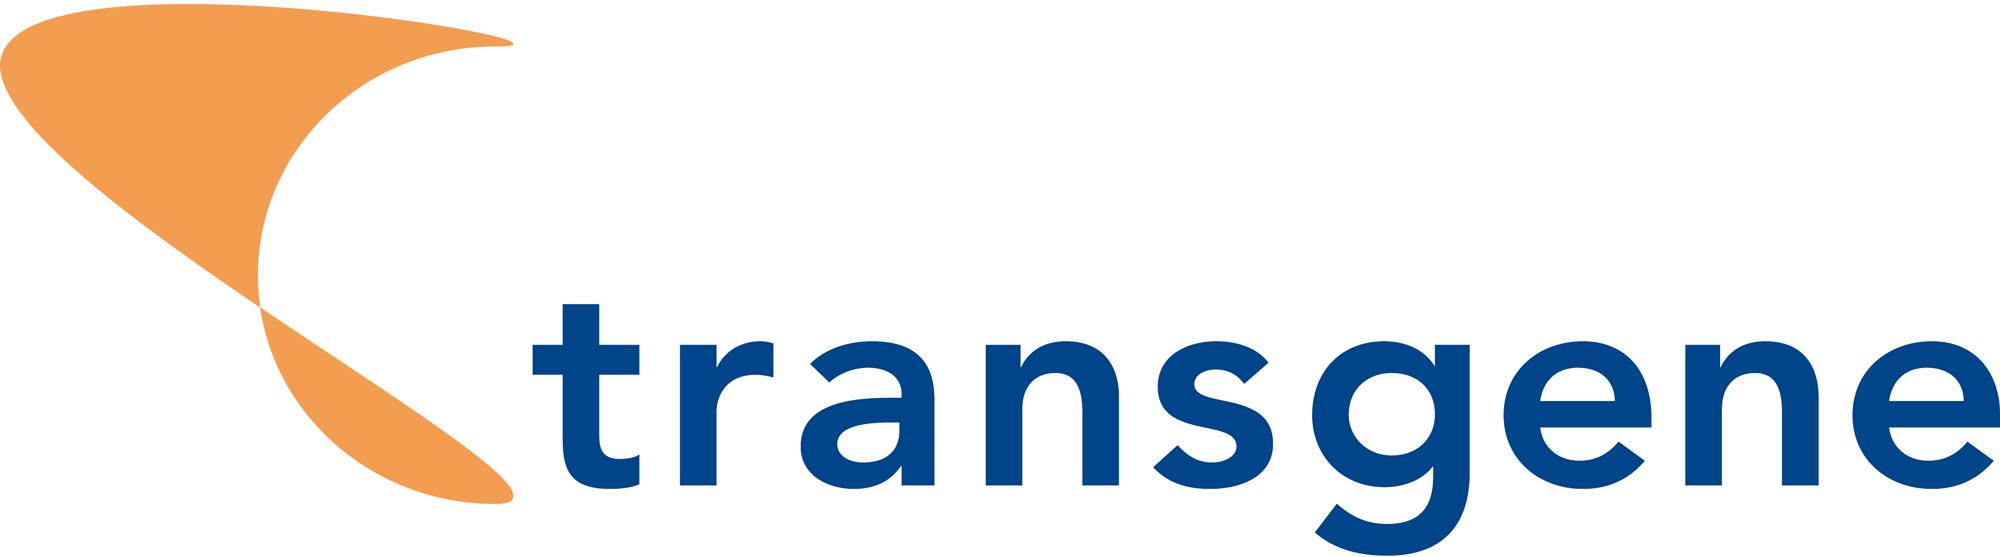 «Трансджин» (Transgene).